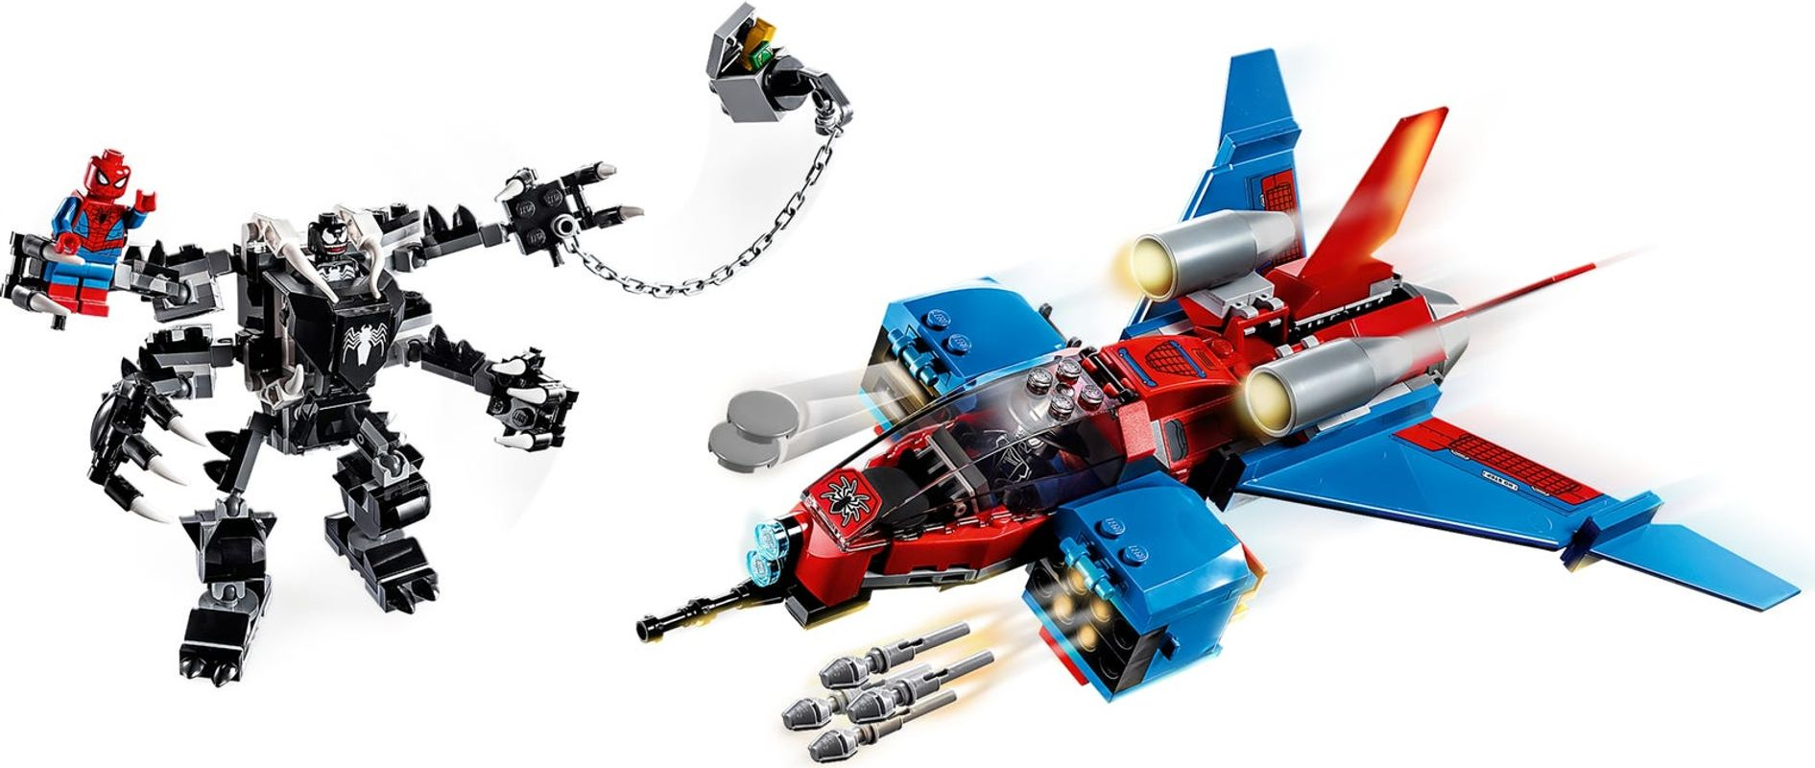 Spiderjet vs. Venom Mech gameplay